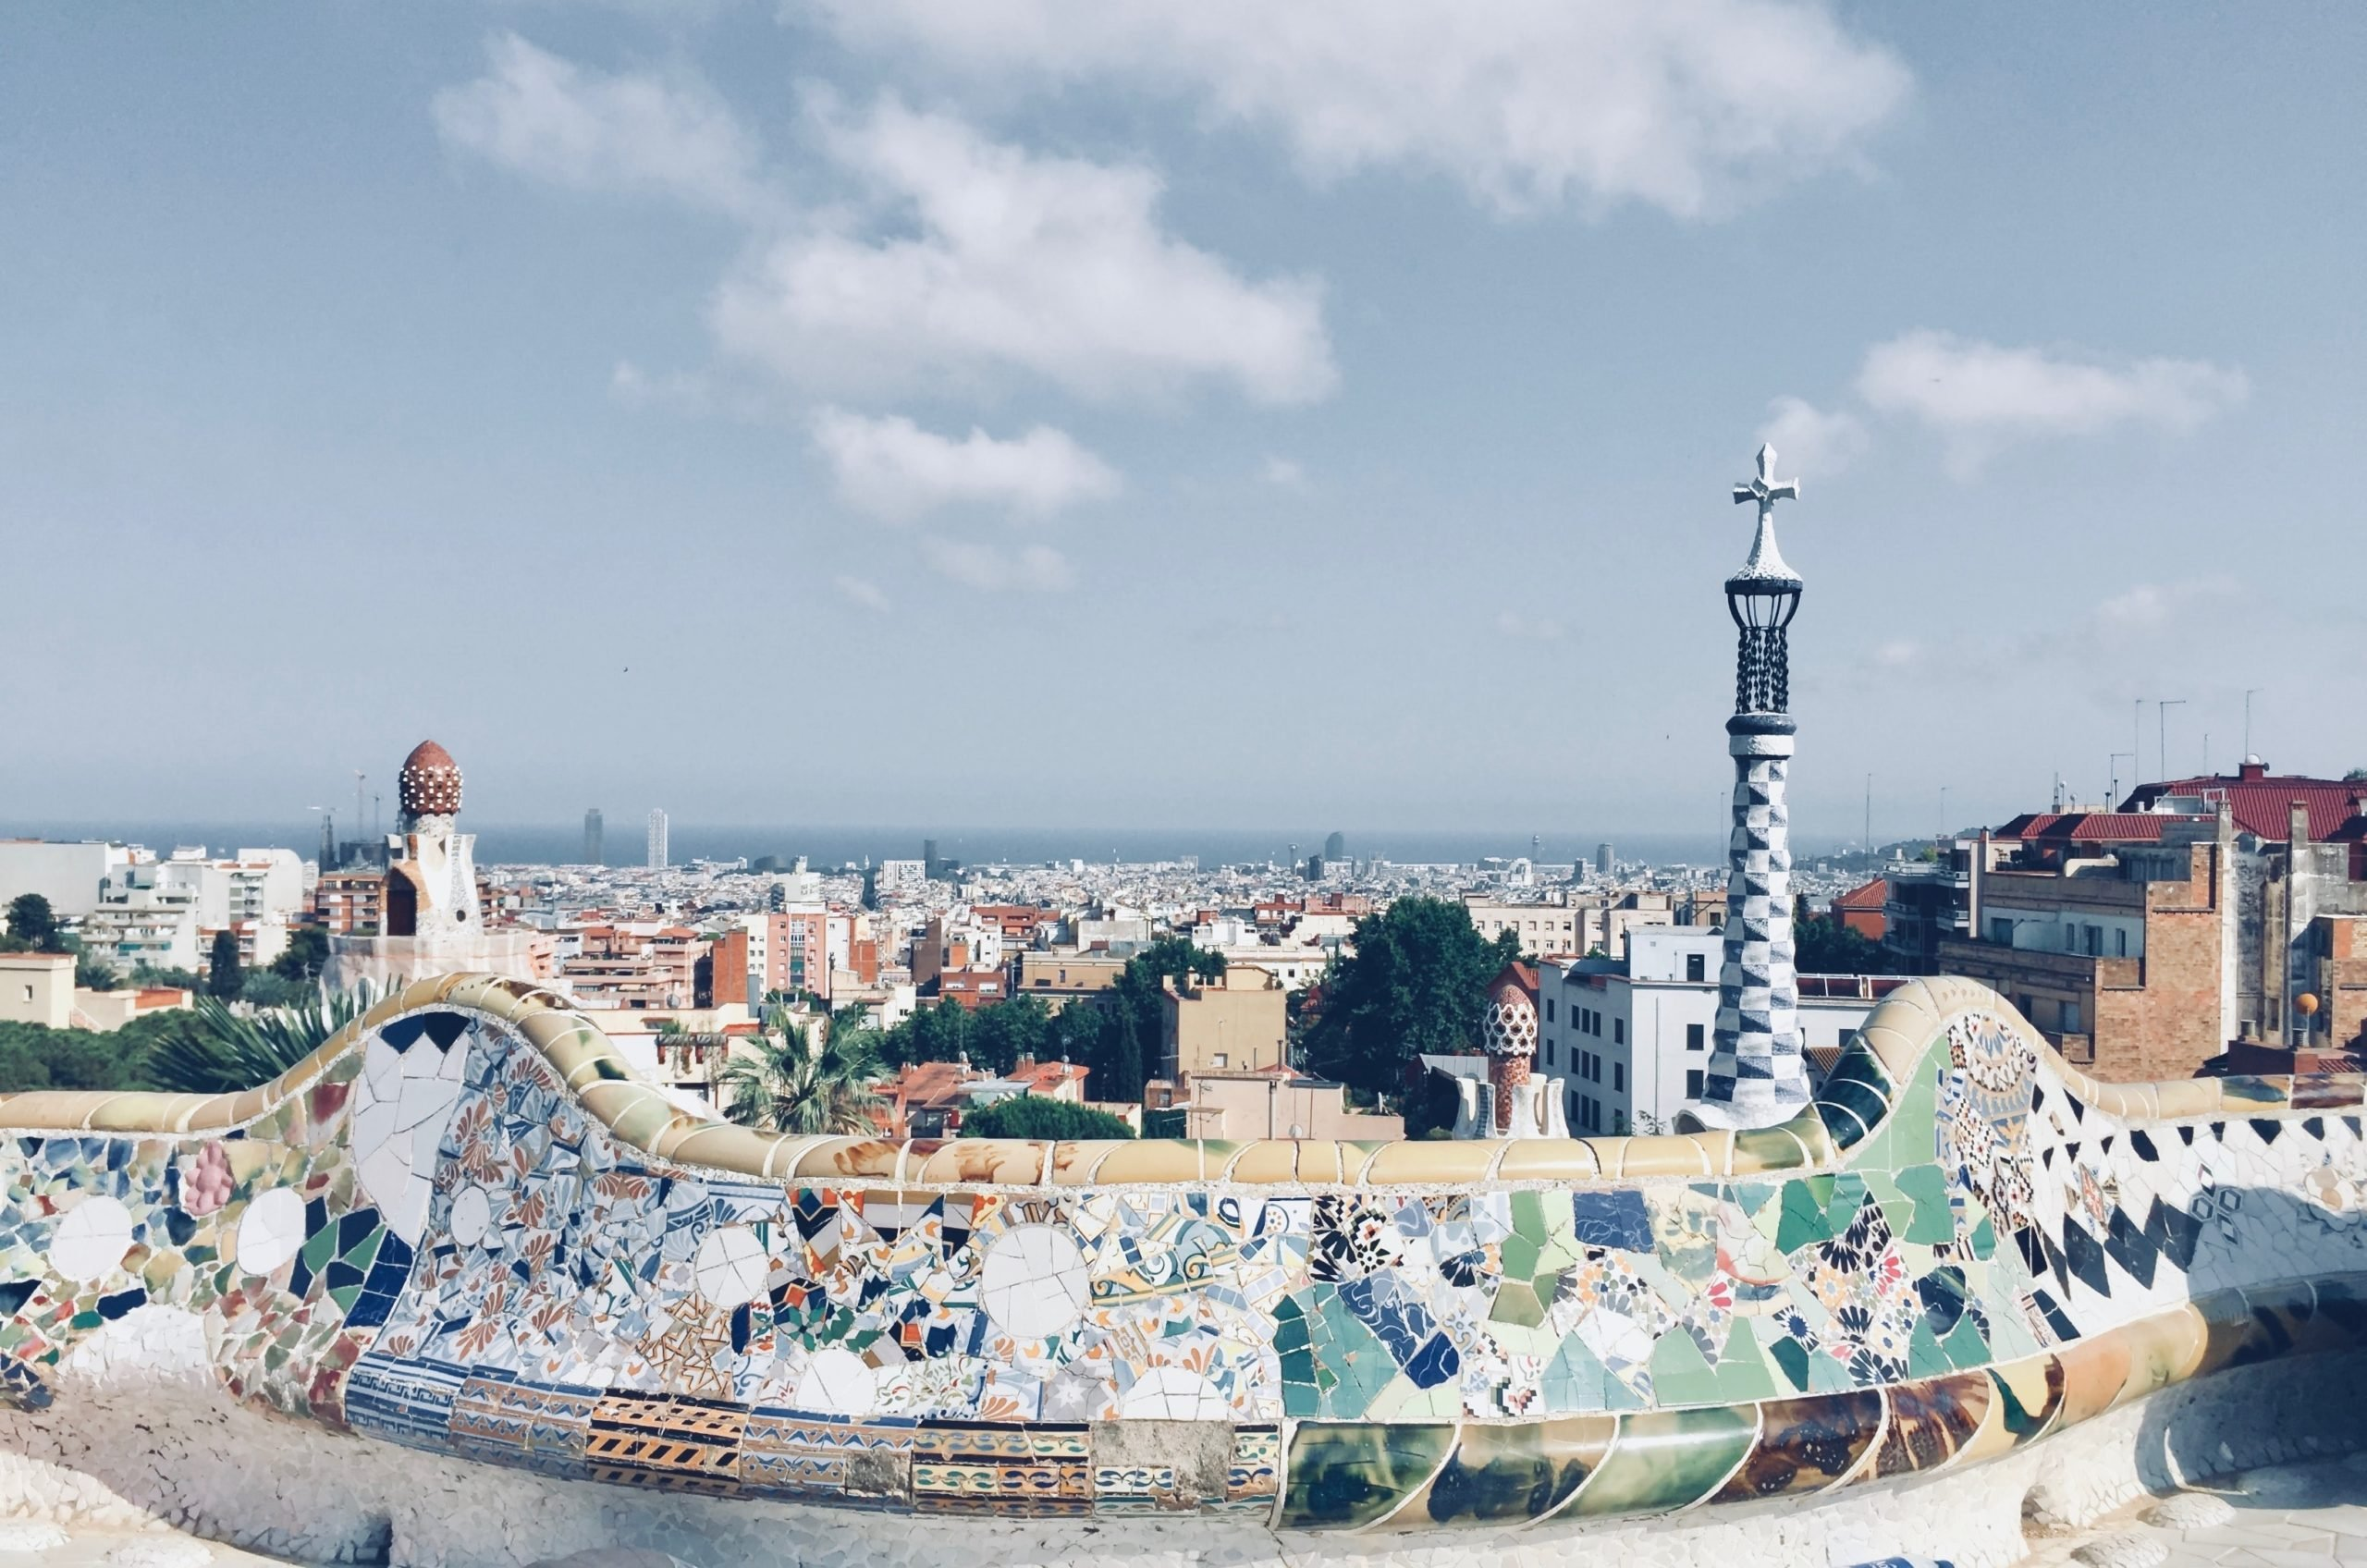 Espanha: Europa reabre fronteiras para turistas estrangeiros